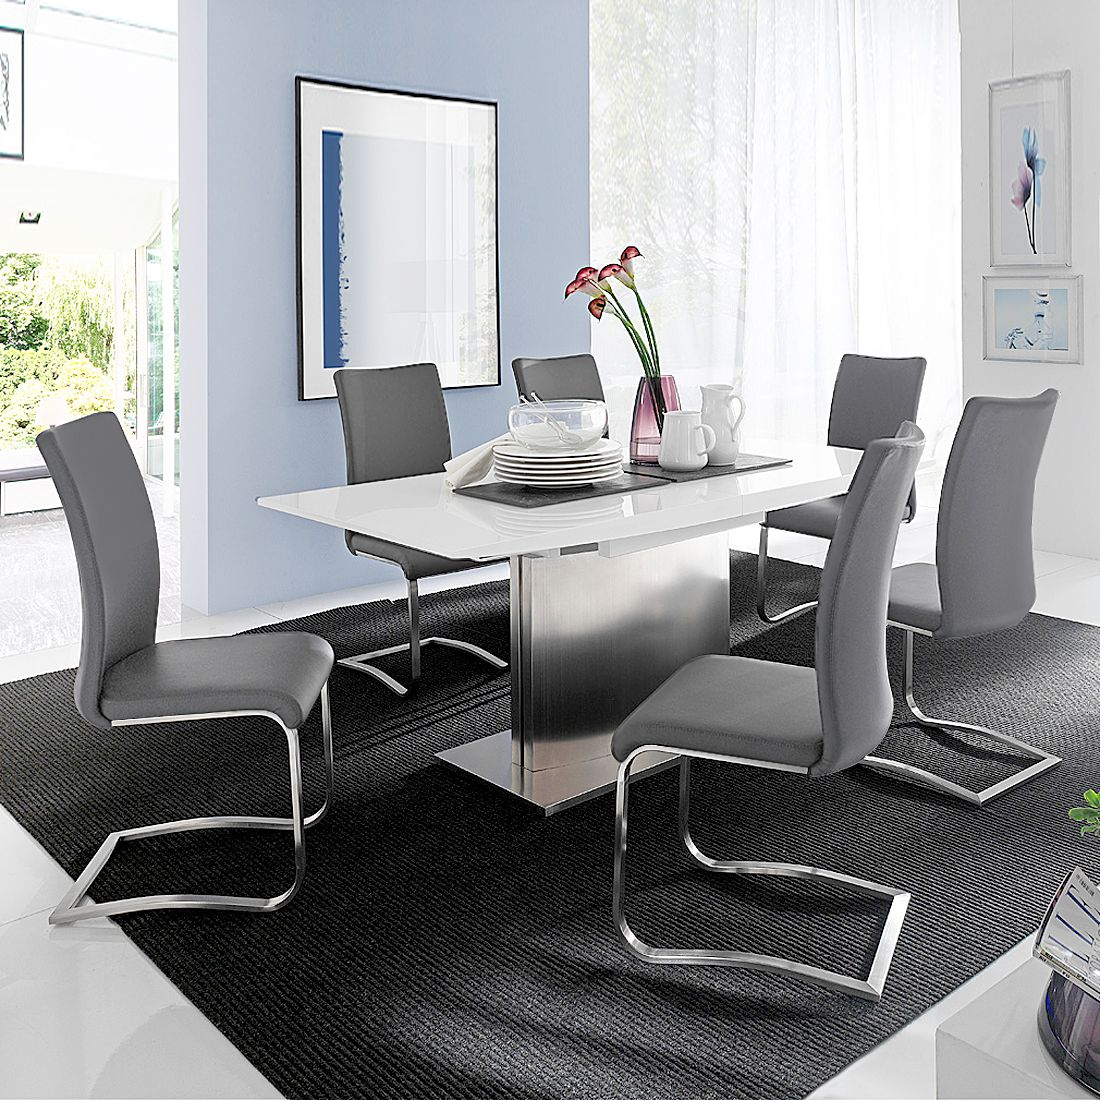 Bellinzona meubles en ligne for Ameublement en ligne